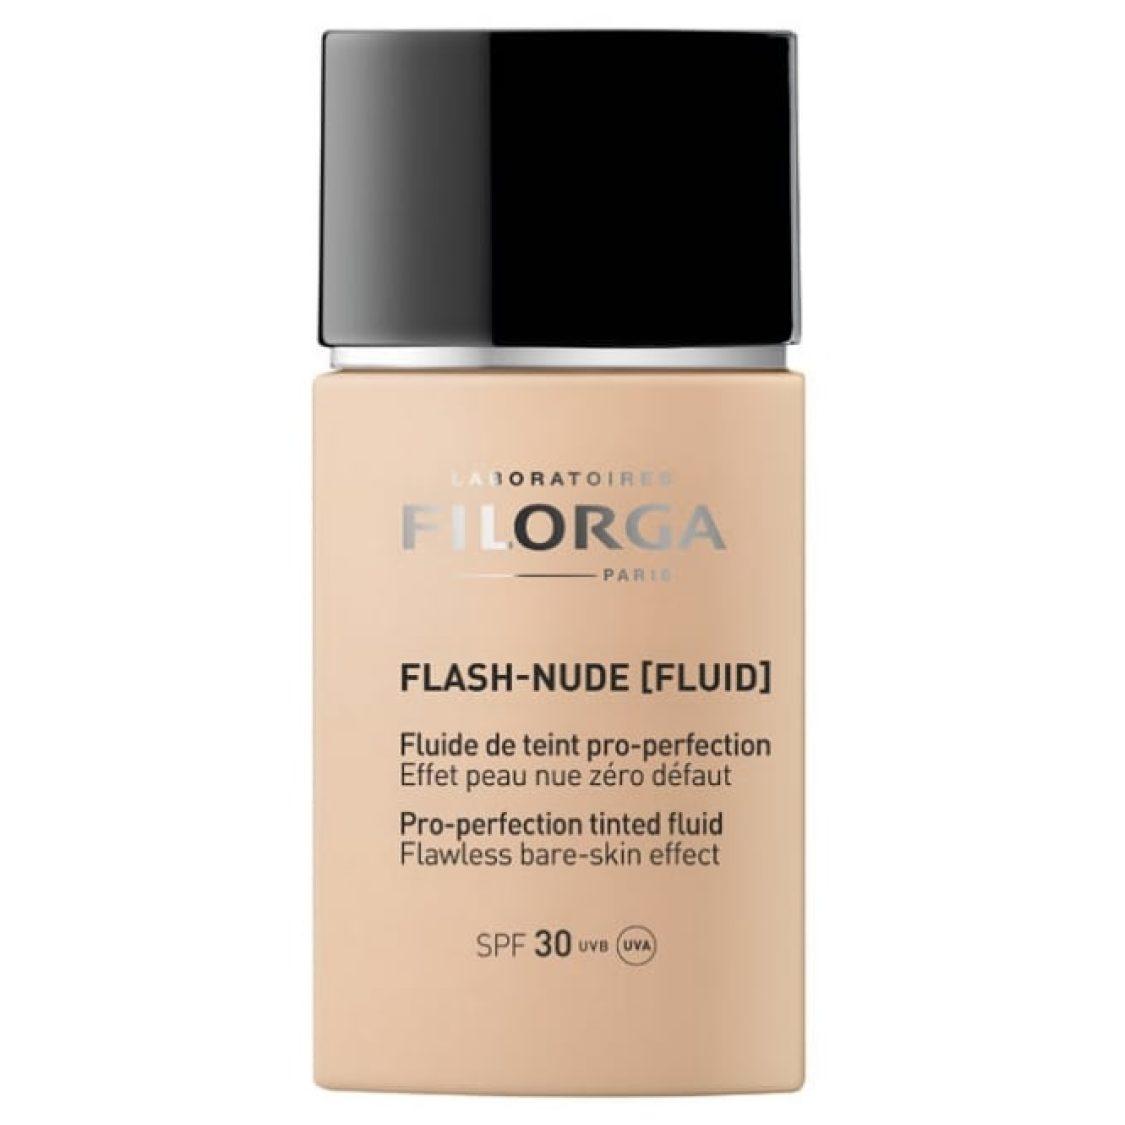 Filorga - Flash-Nude (Fluid) 03 - Nude Amber 30ml